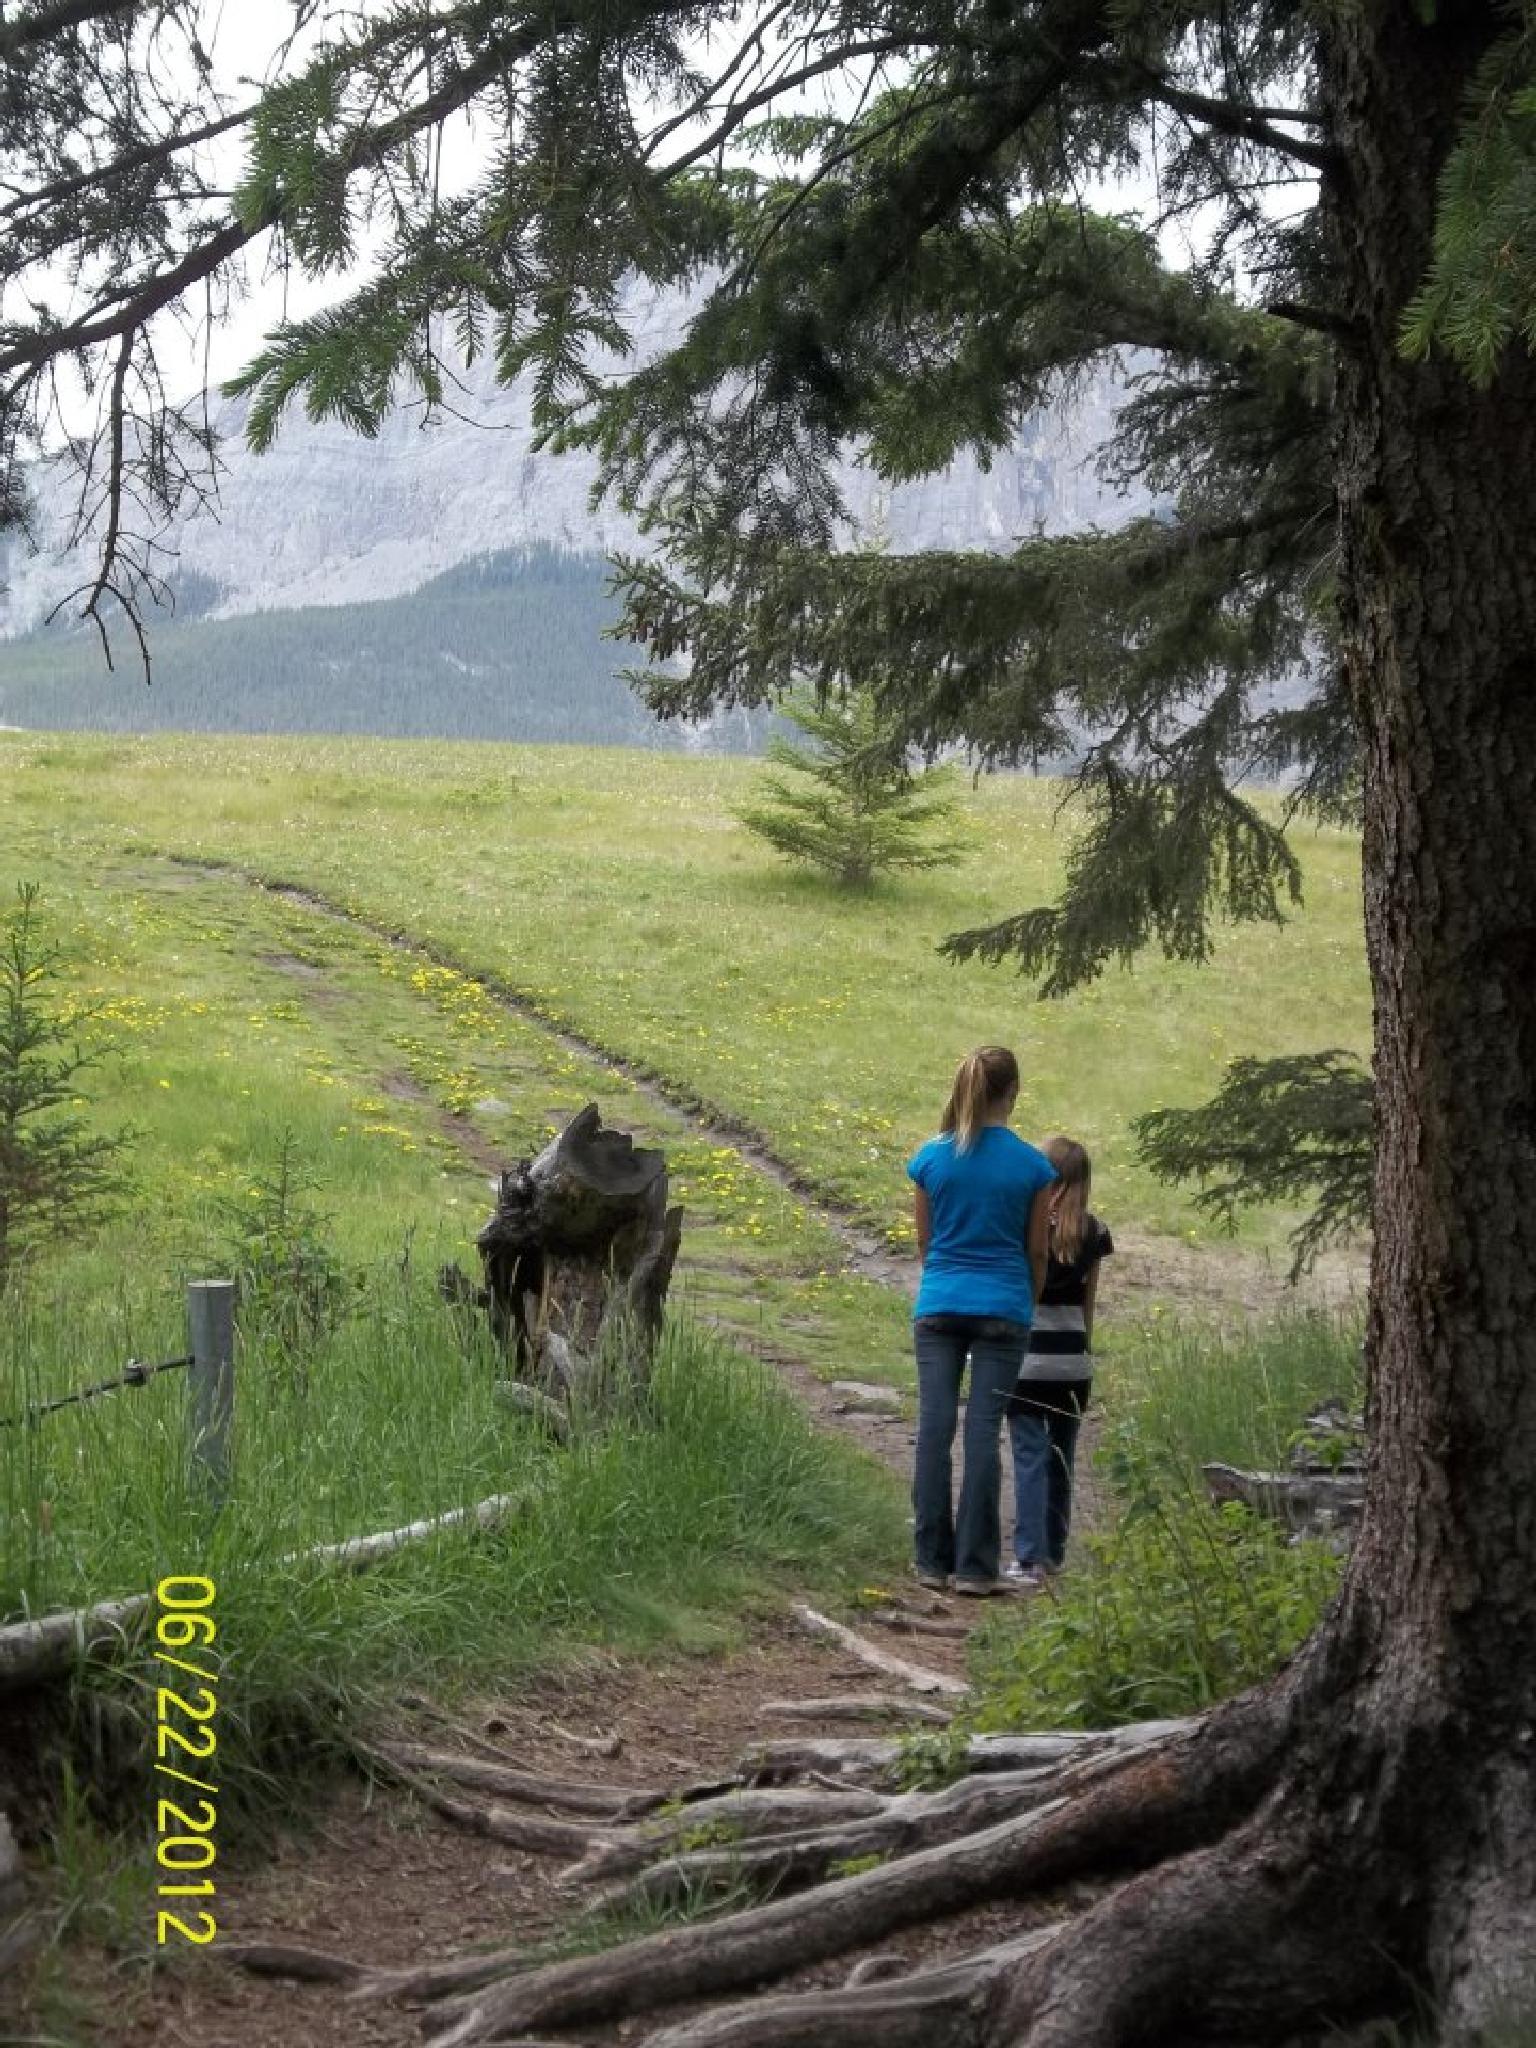 Exploring in Canada by deborah.m.mcclintock